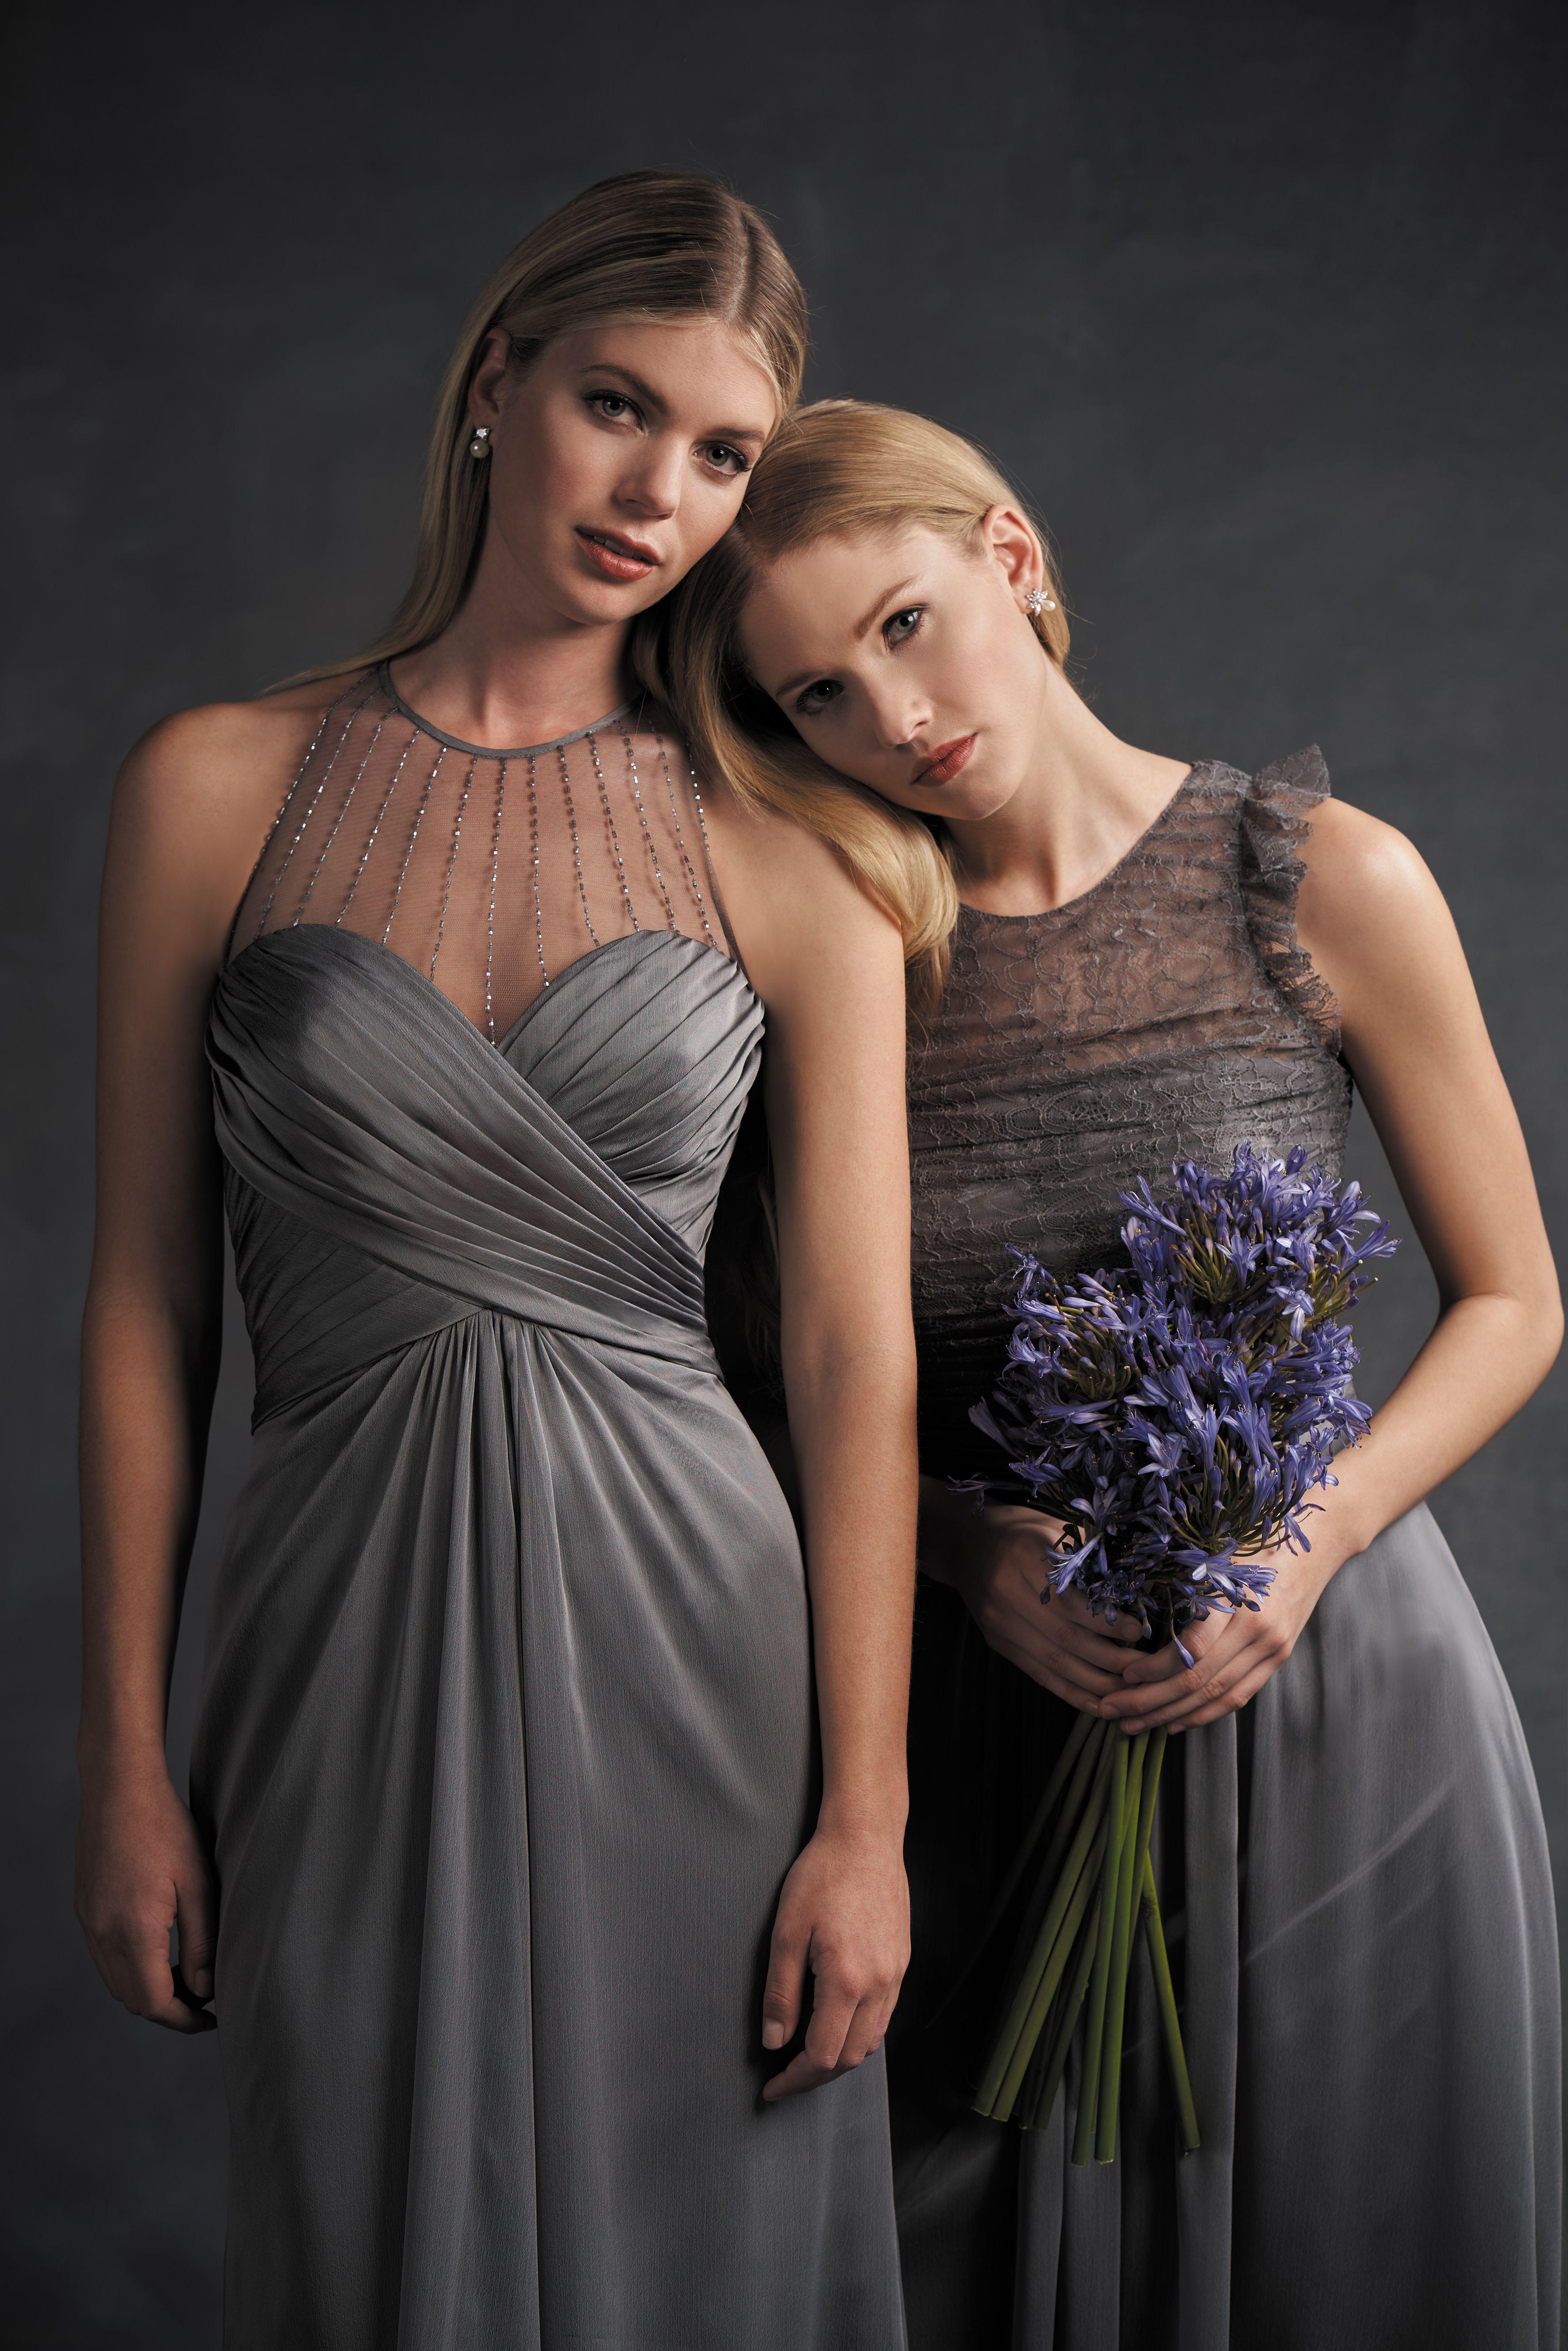 Bridesmaid dresses glamorous bridesmaid dresses silver bridesmaid dresses glamorous bridesmaid dresses silver bridesmaid dresses belsoie mix and match ombrellifo Choice Image